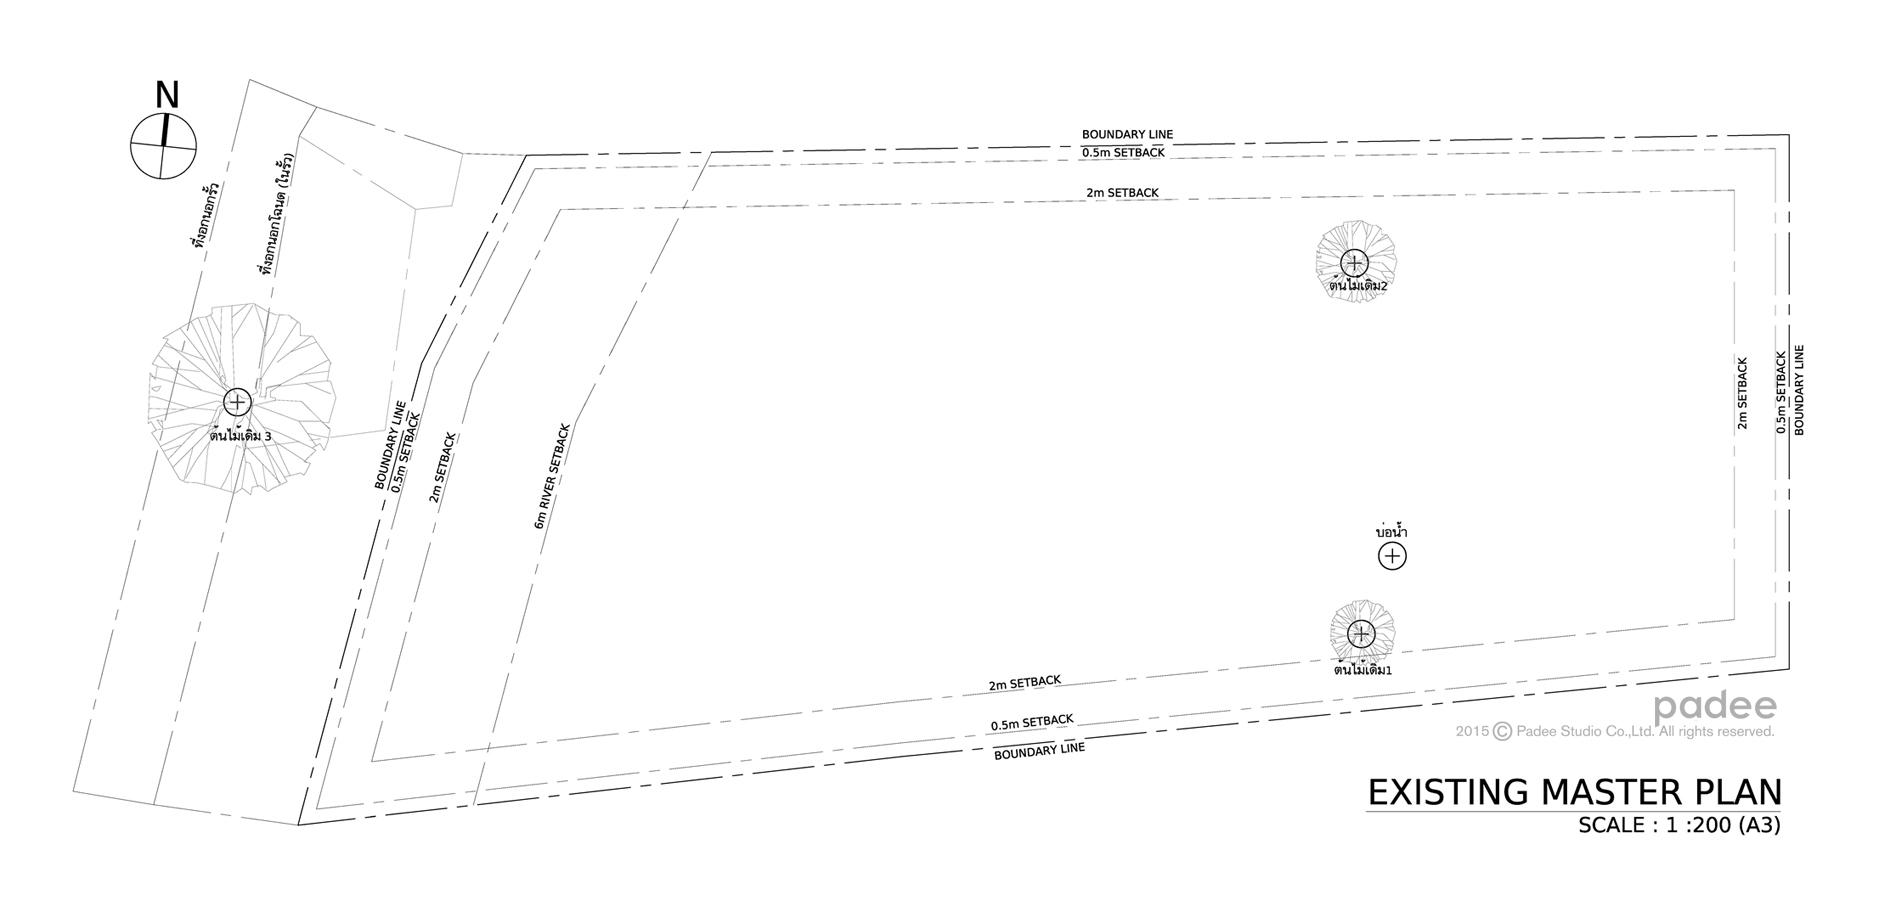 2015.04.27 PD B2 ExistingMasterPlan logo.jpg